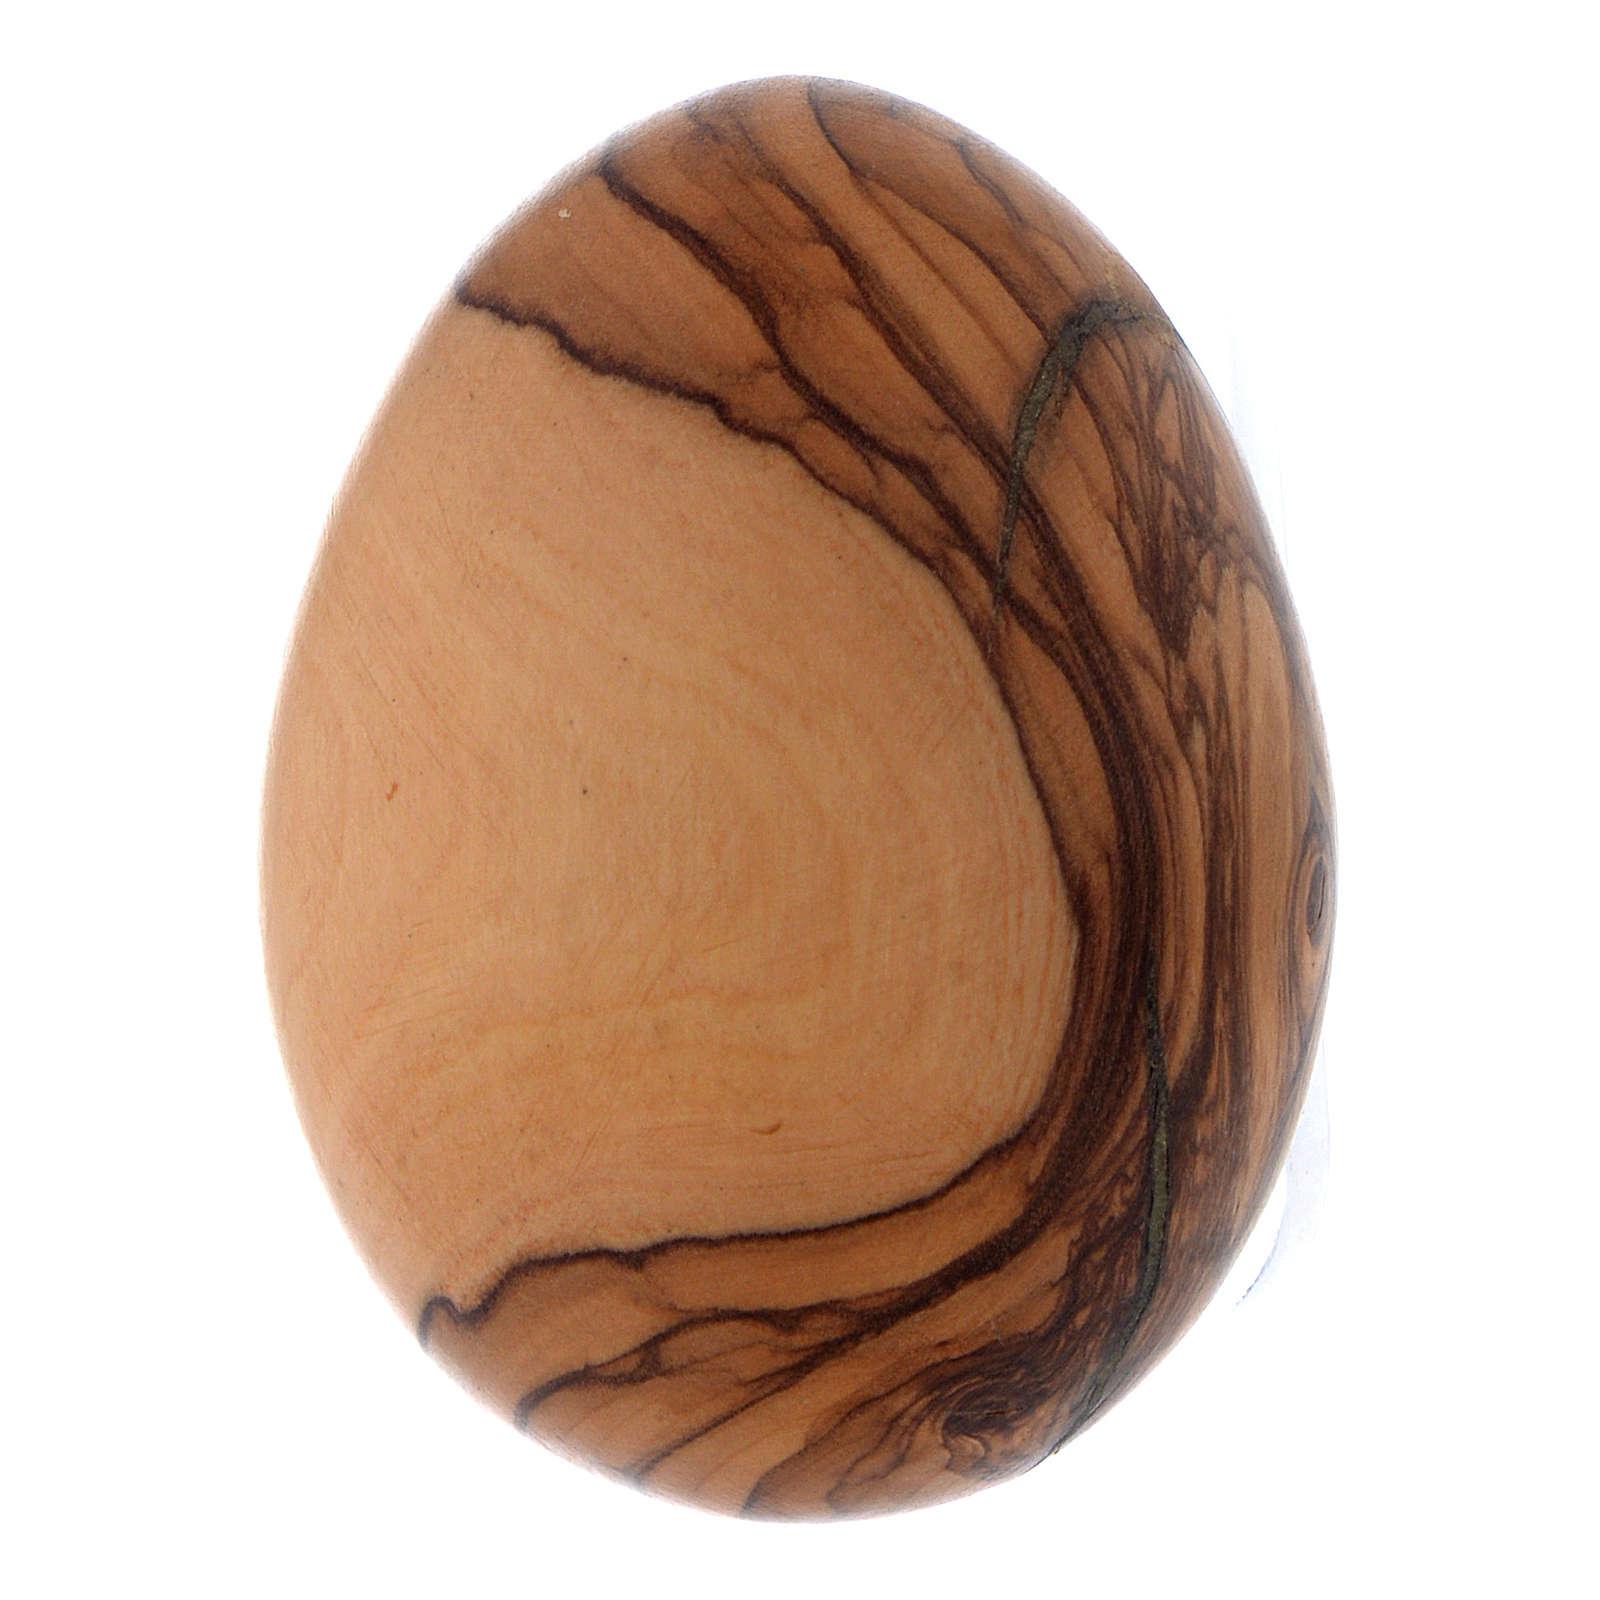 Olive wood egg 3